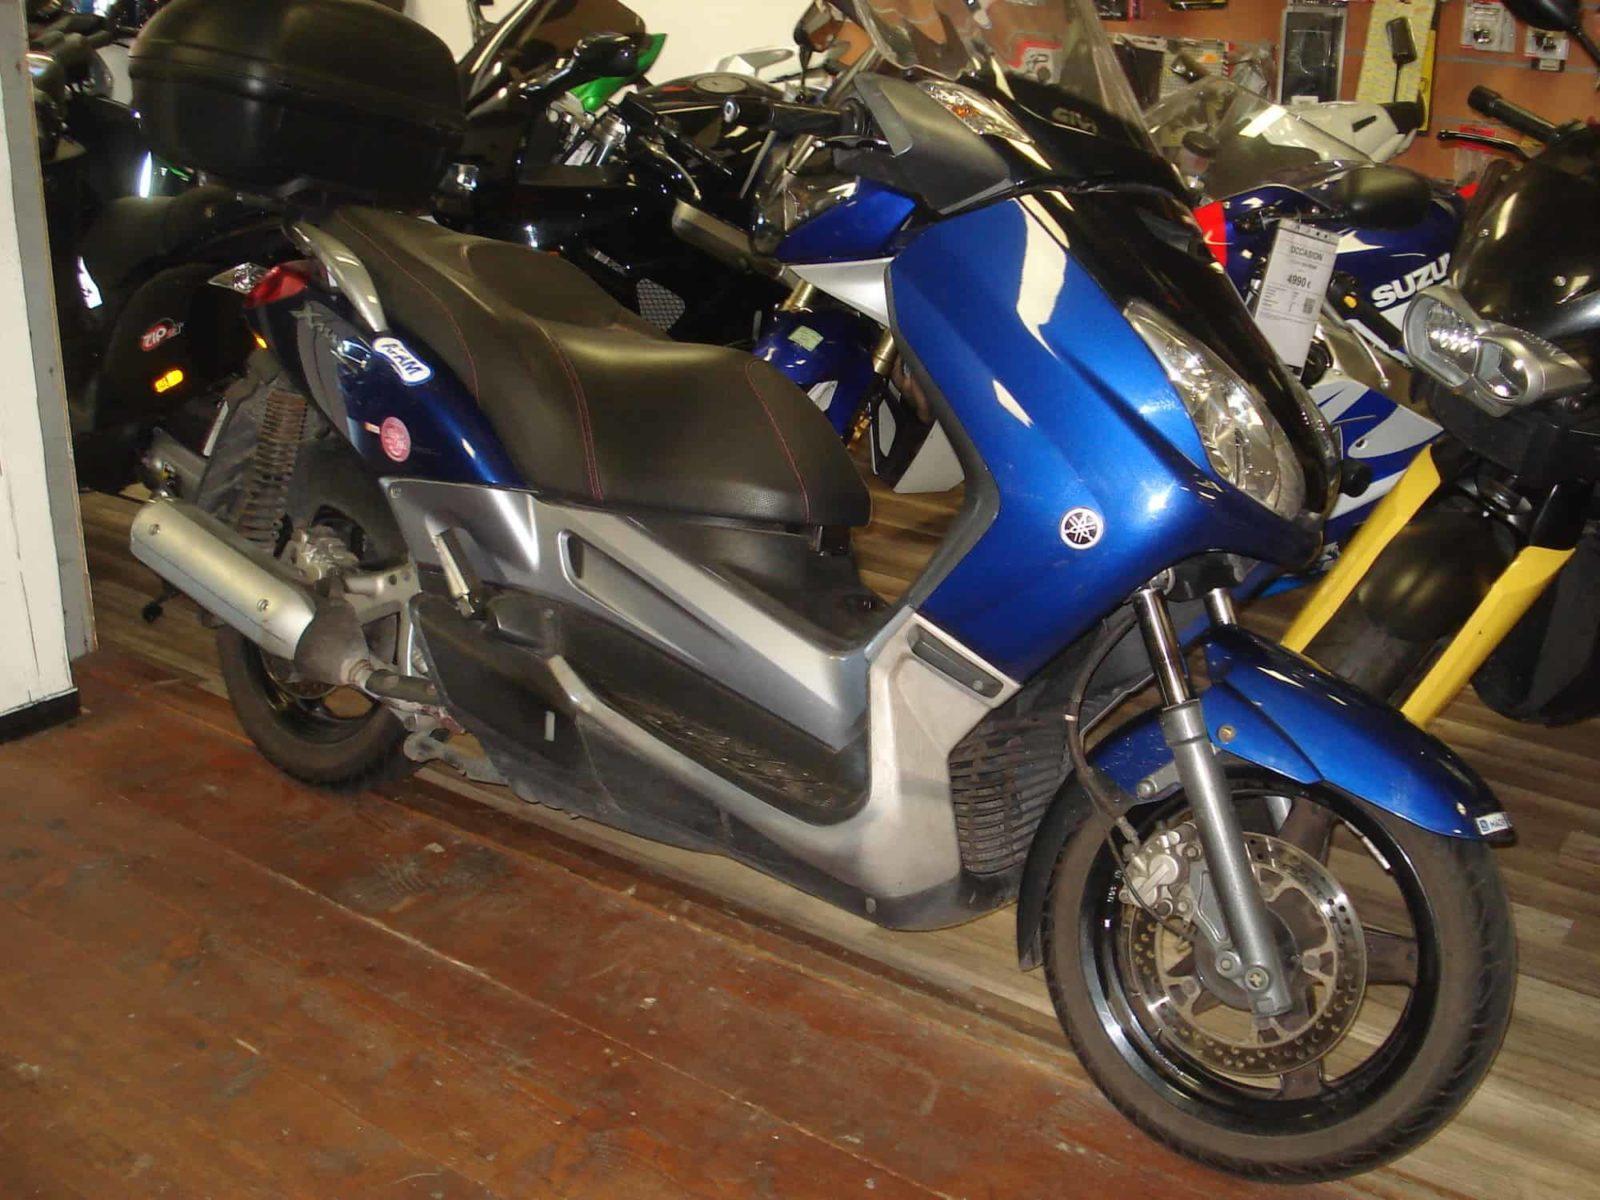 Vendu ! Yamaha Xmax 250 – 1700€